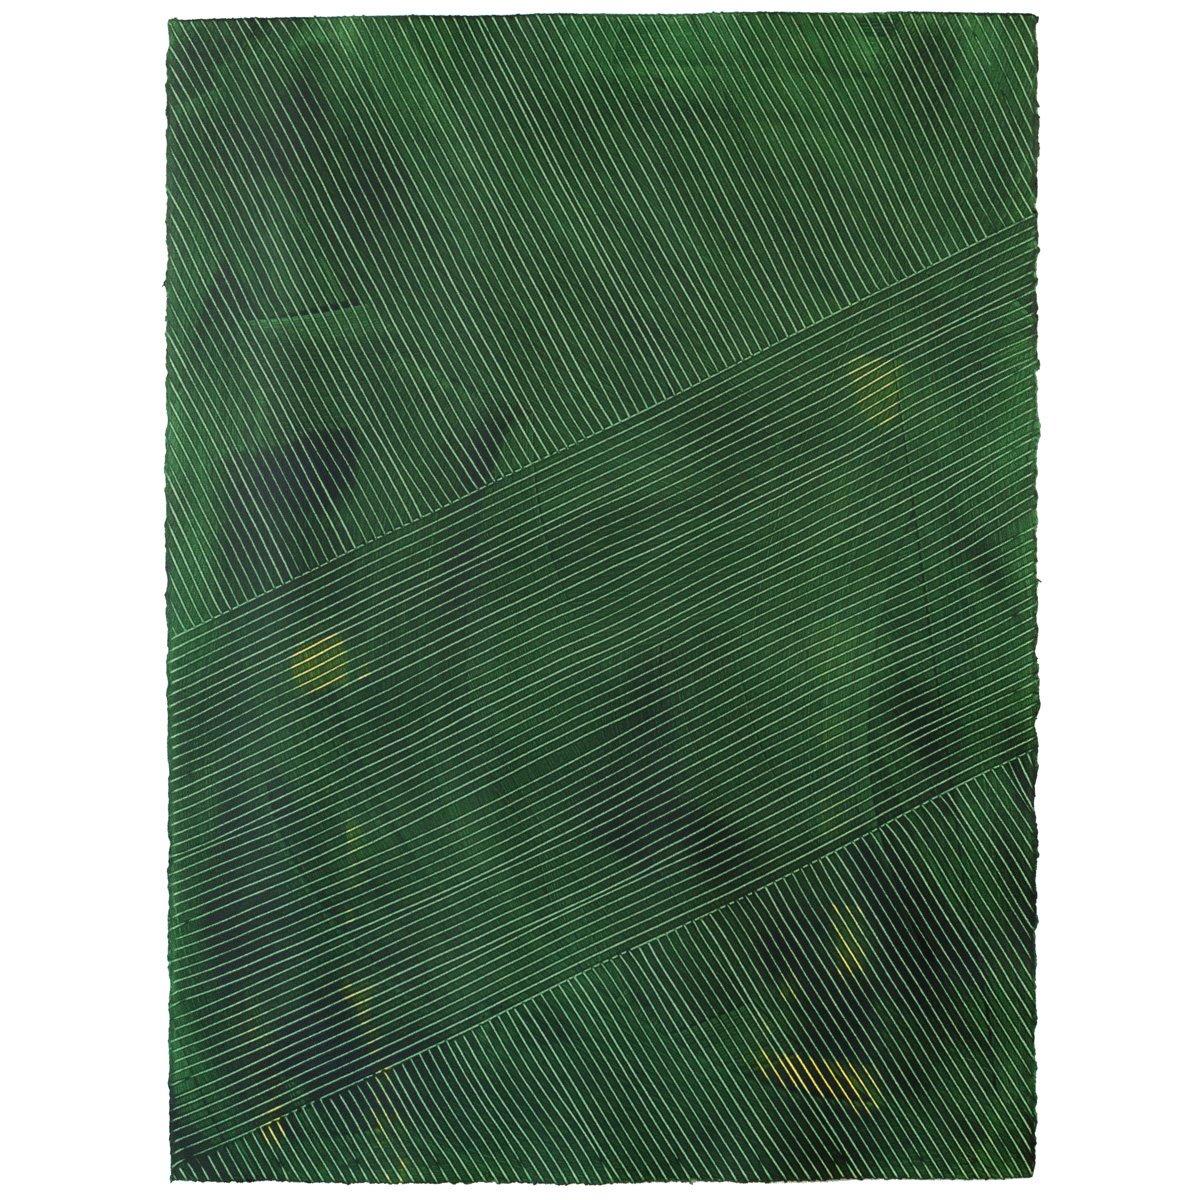 Lanai - Jungle - Hand-Painted Sheet Wallpaper